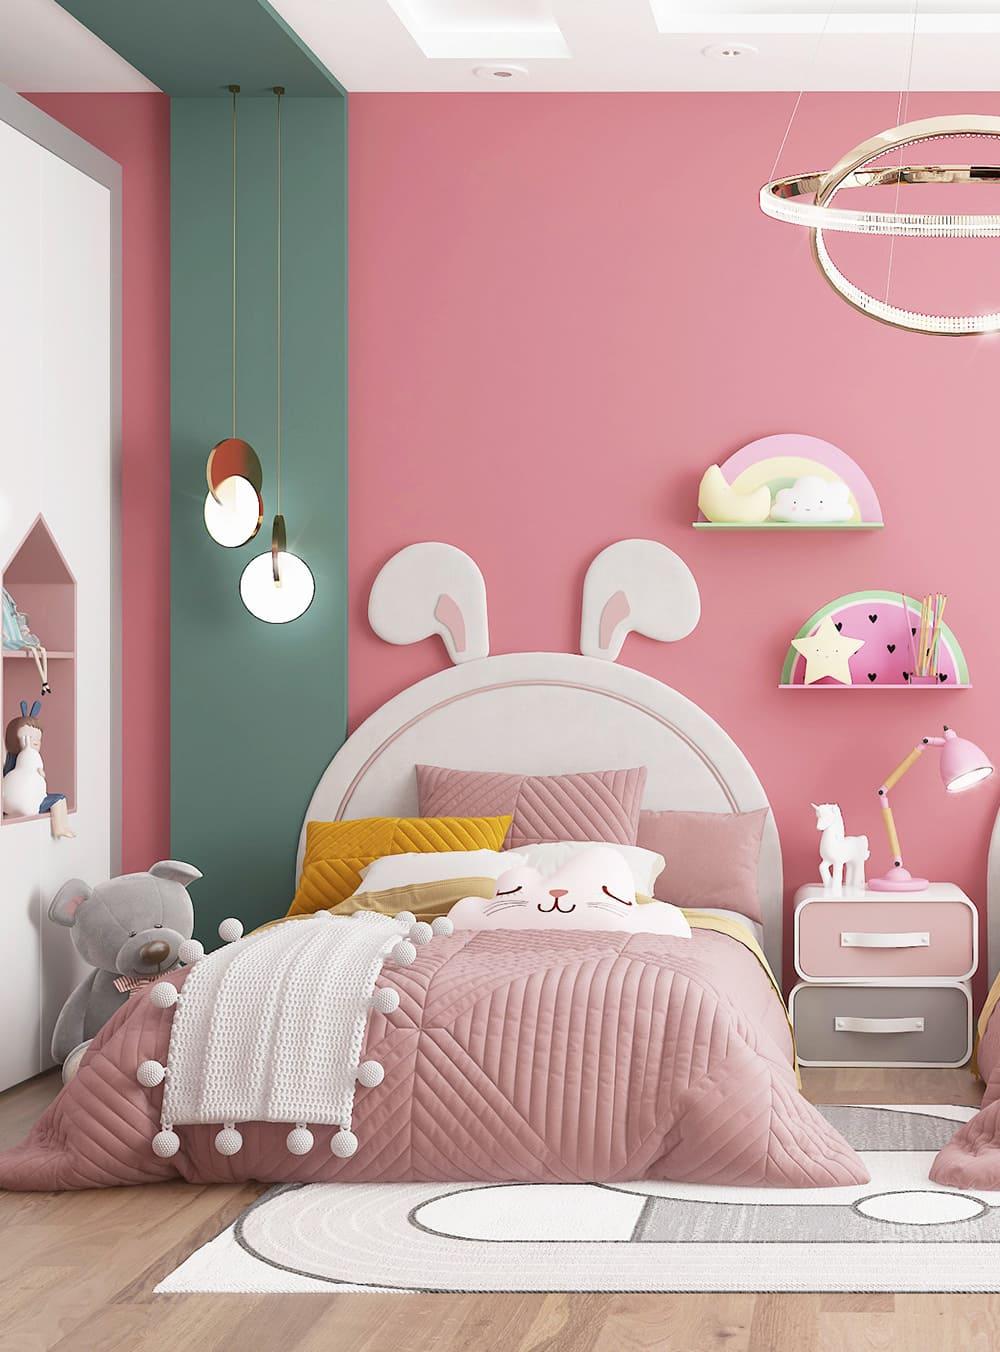 интерьер детской комнаты фото 21